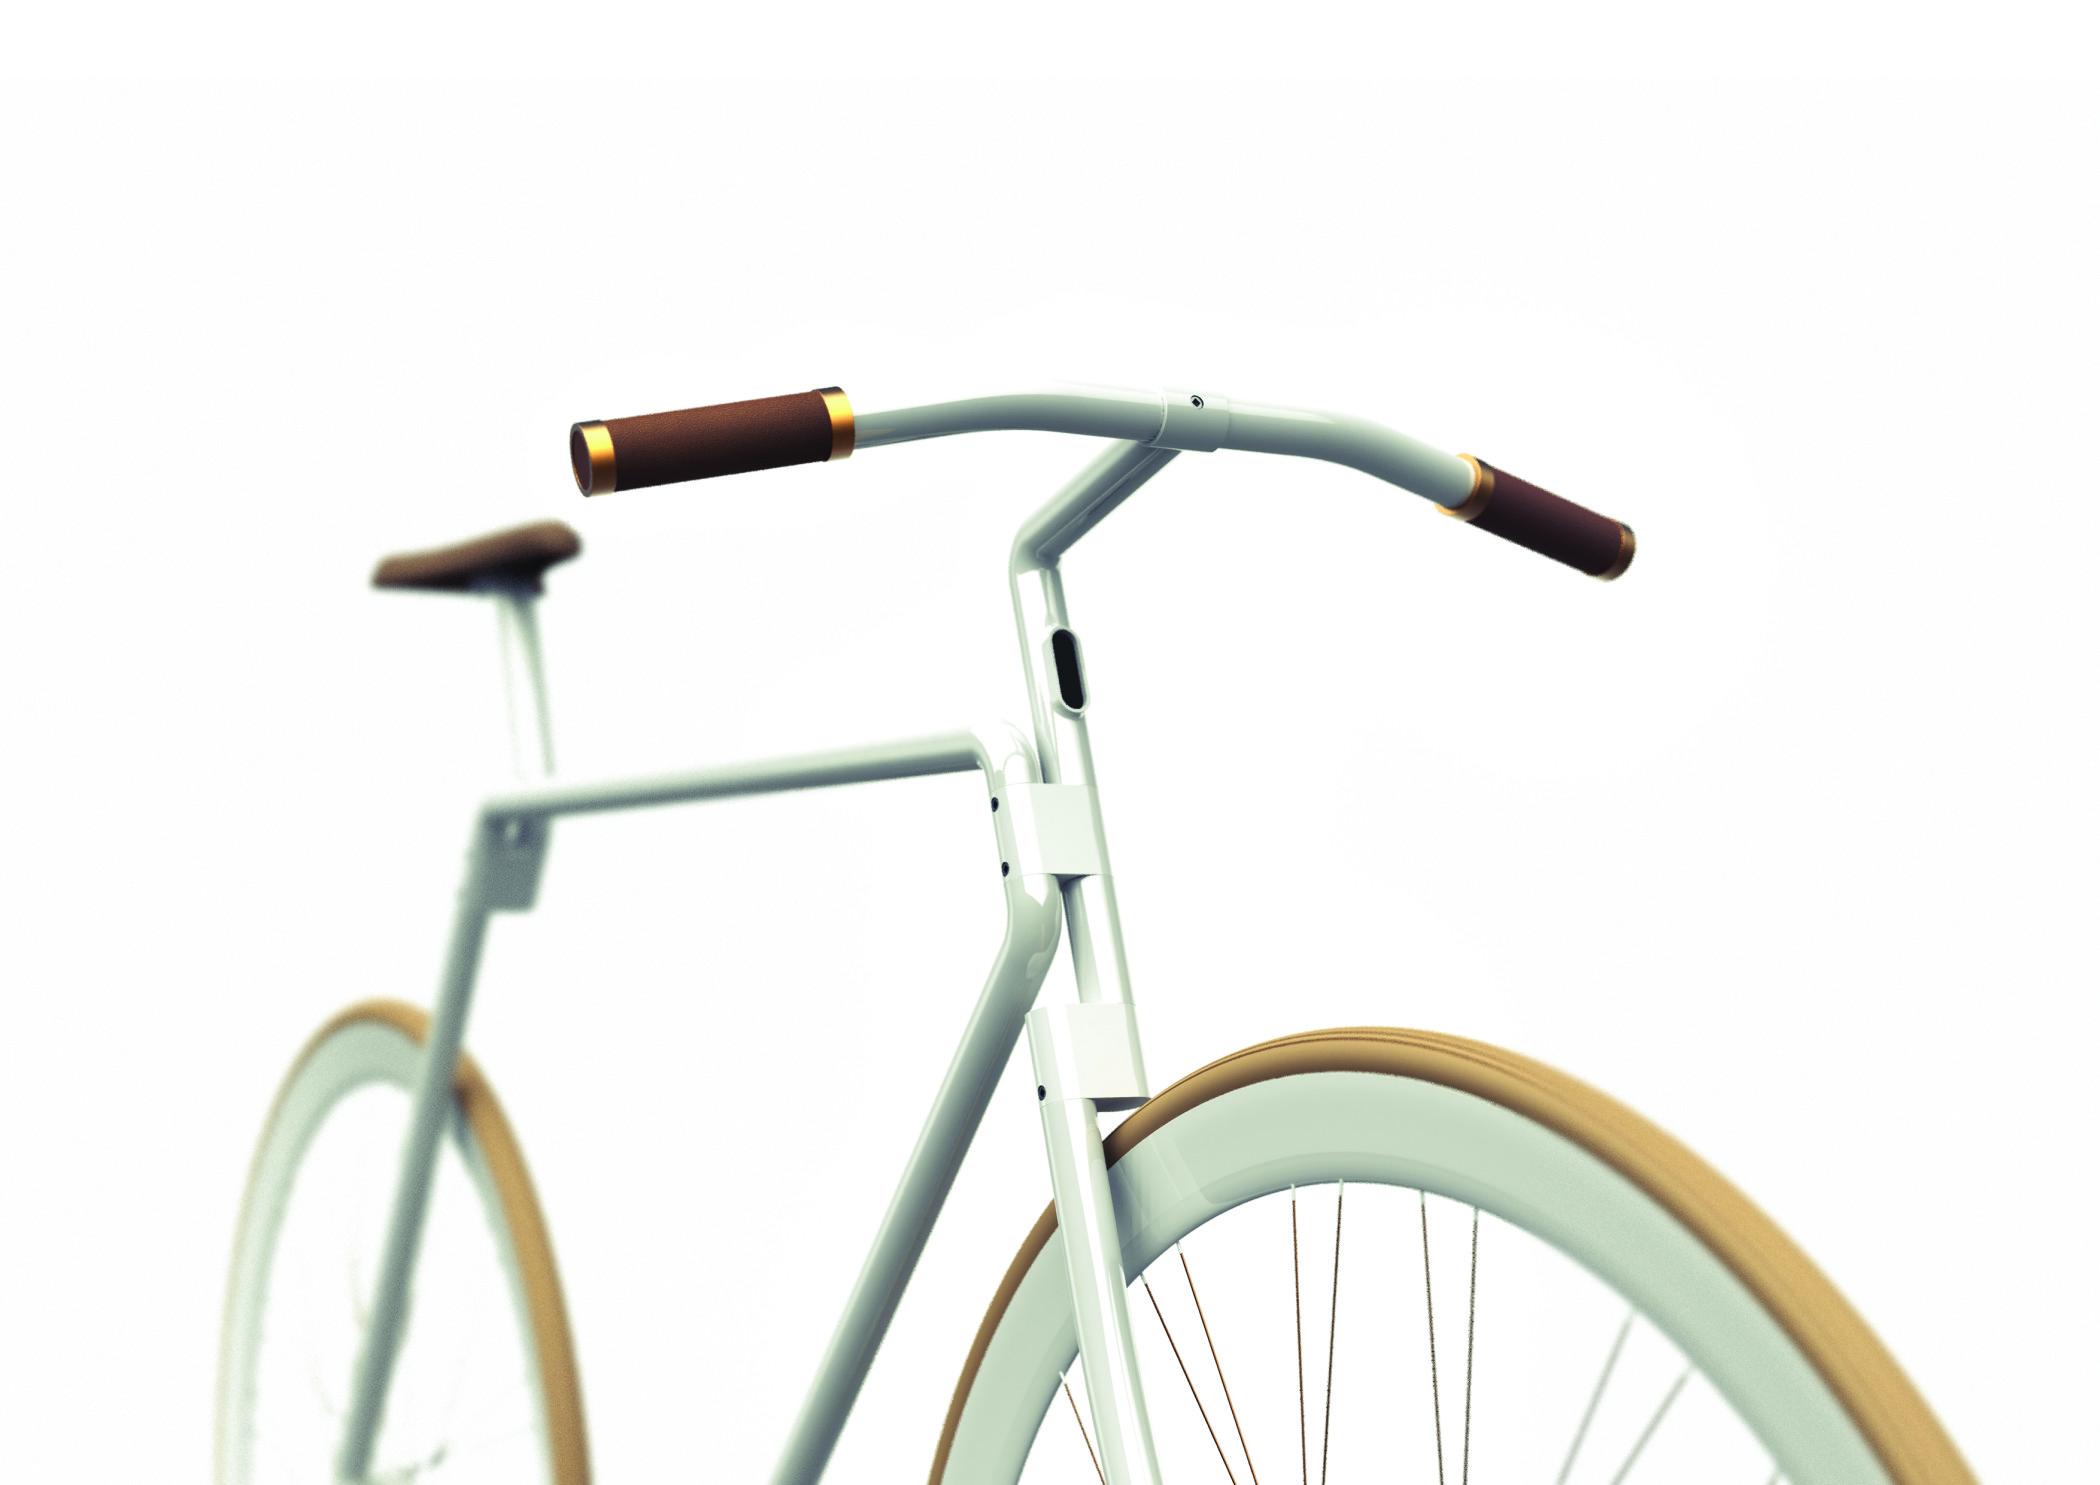 kit-bike_design_003